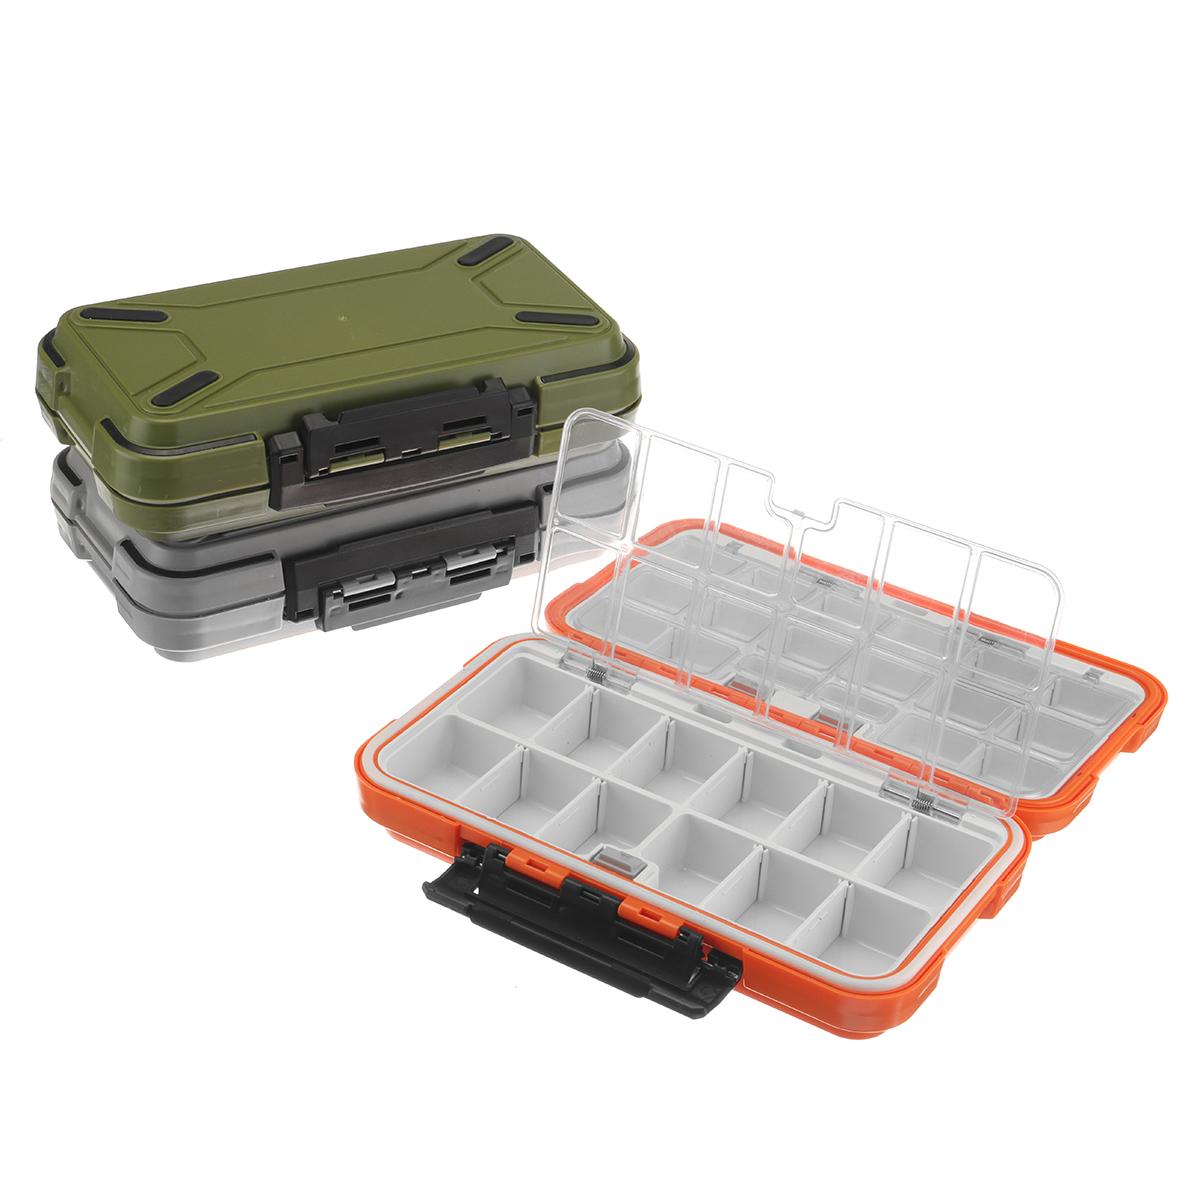 Small Plastic Fishing Lure Fish Hook Bait Storage Tackle Organizer Case Box